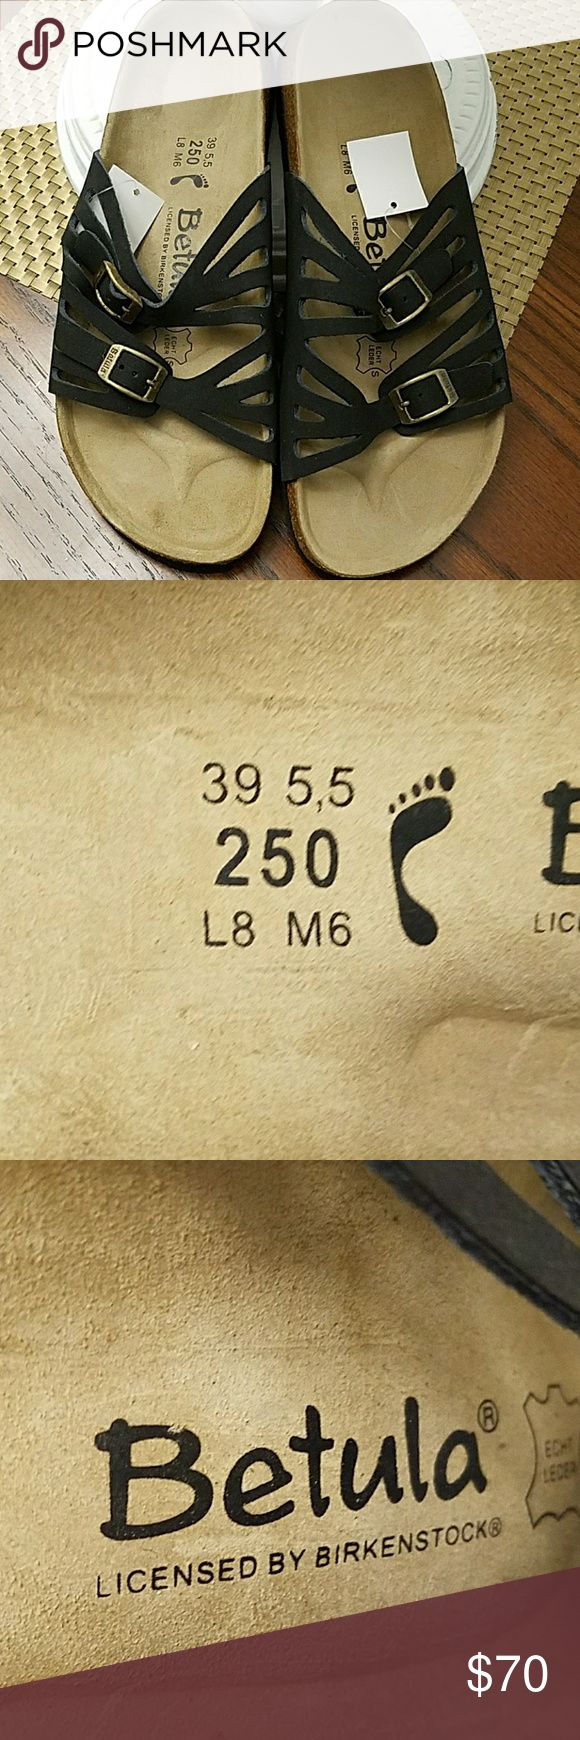 Betula Birkenstock Sandals NEW Brand new no damage.  Ladies 8, men's 6. No box. Birkenstock Shoes Sandals